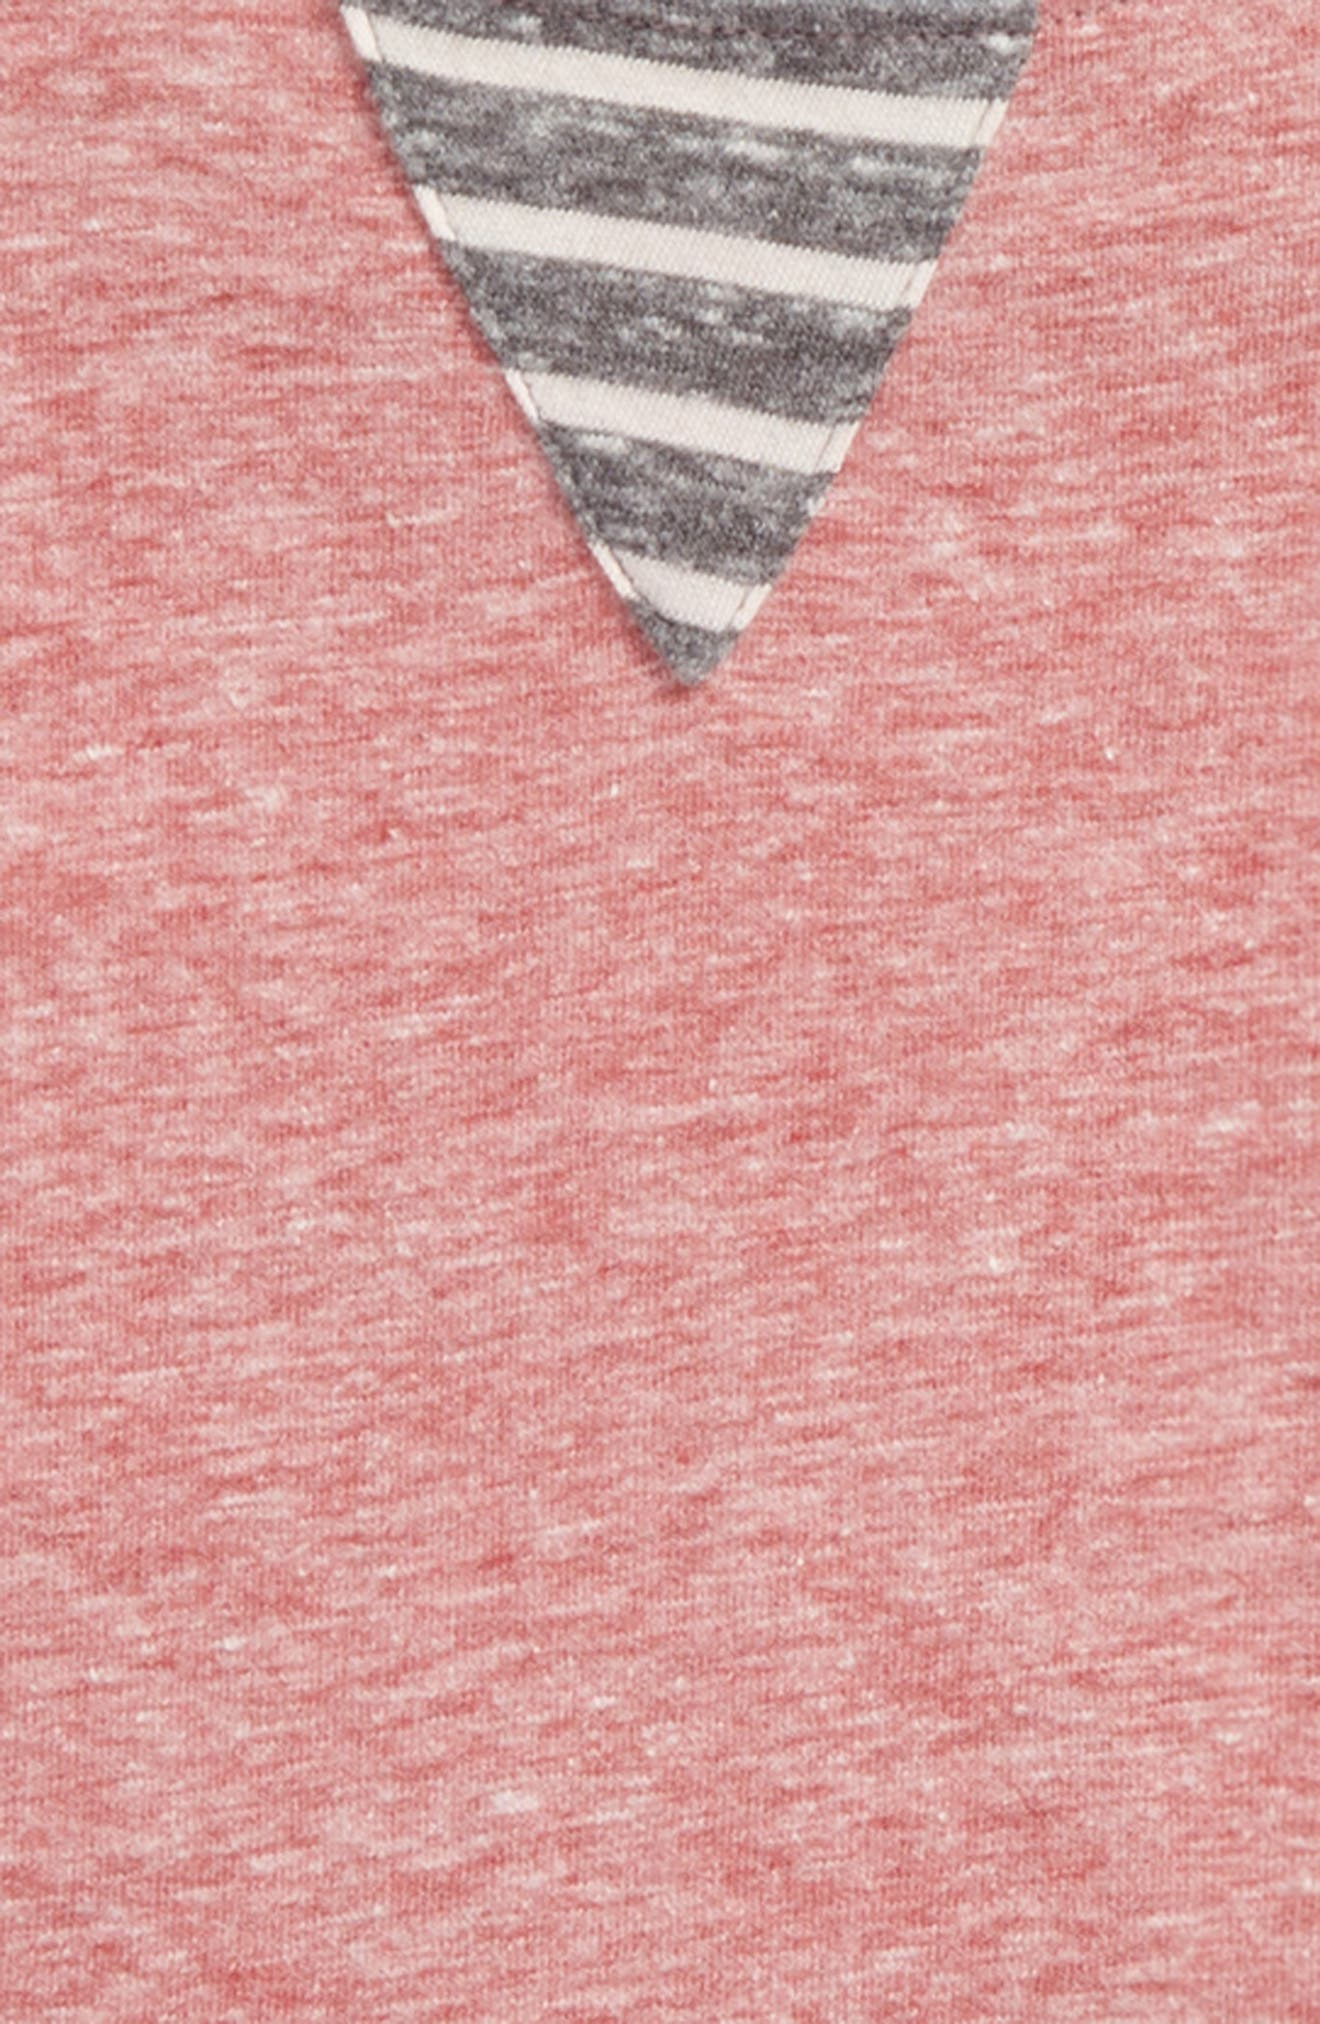 Ryker T-Shirt,                             Alternate thumbnail 3, color,